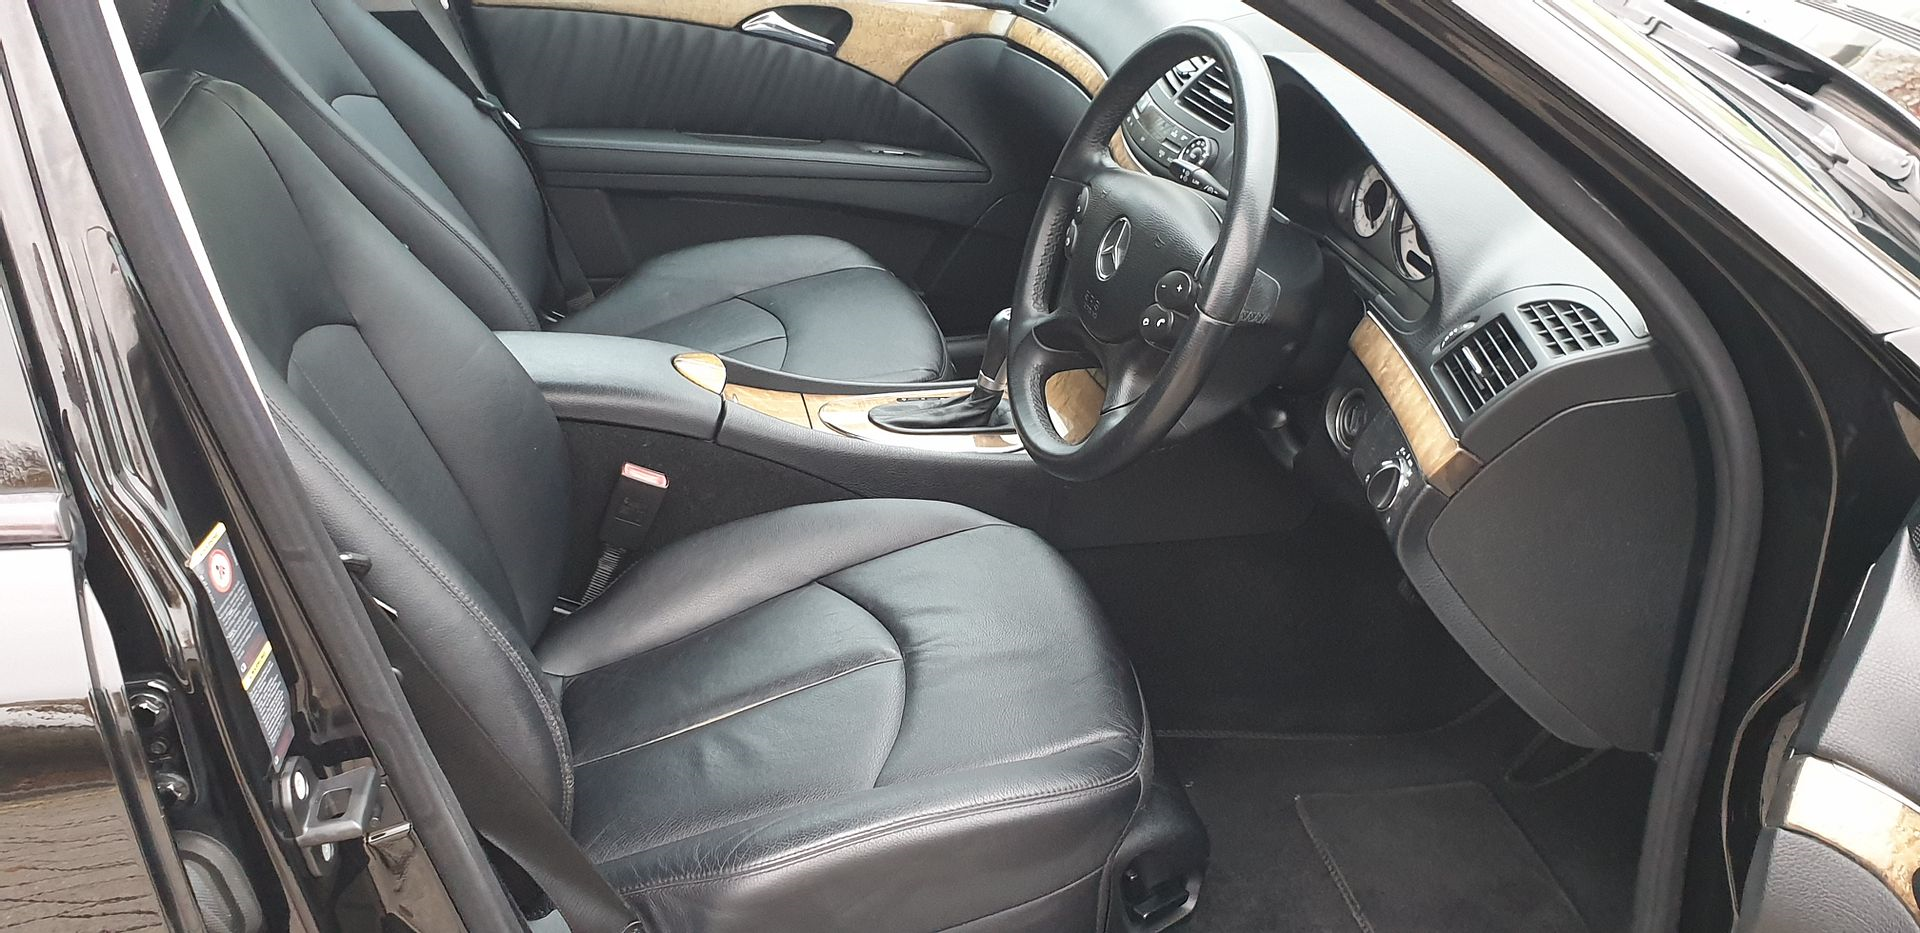 2009 Mercedes e220 cdi avantgarde estate 1 prev owner For Sale (picture 5 of 6)